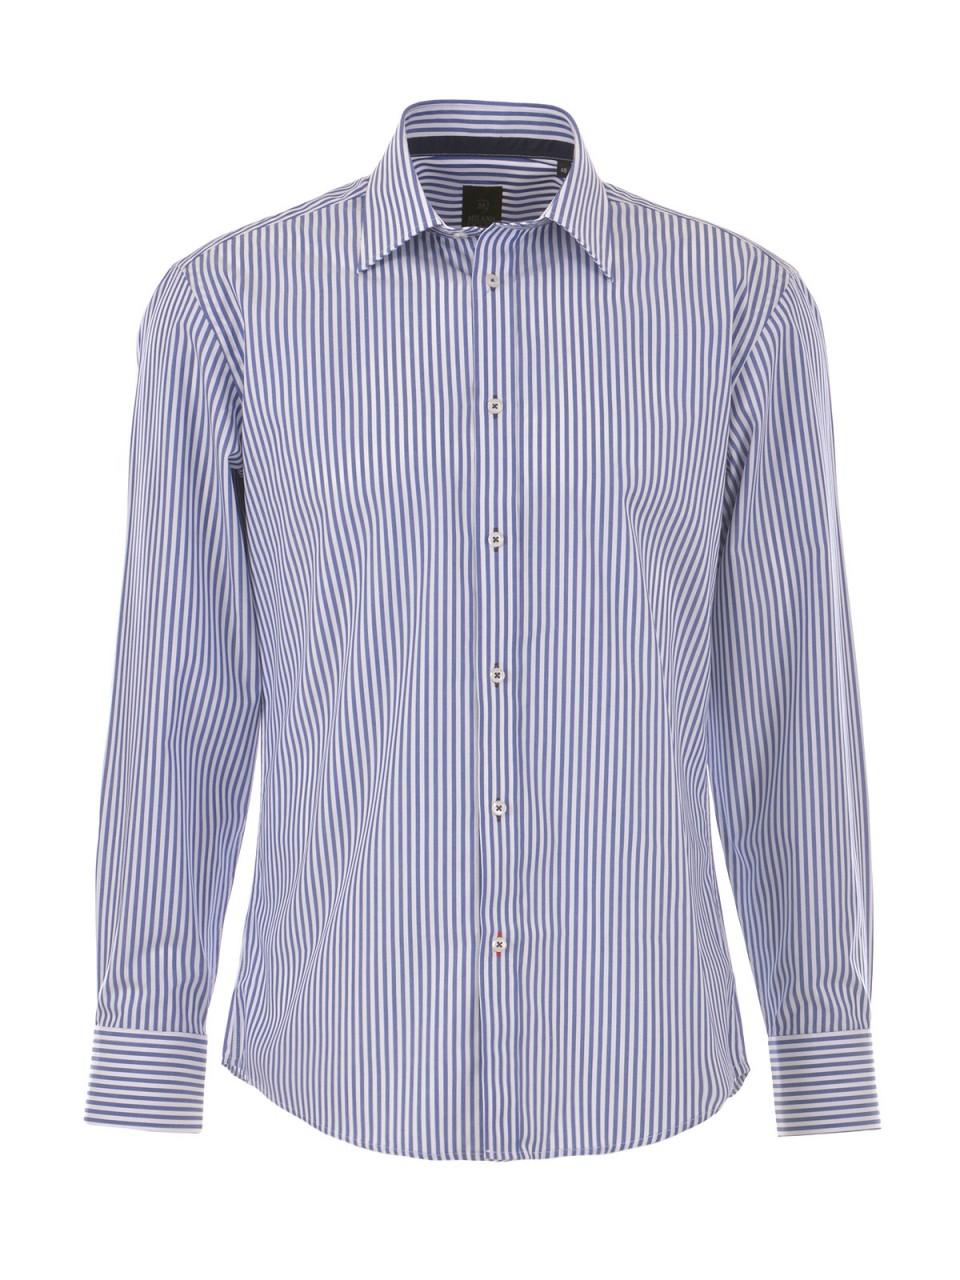 milano-italy-herren-hemd-blau-wei-szlig-gestreift